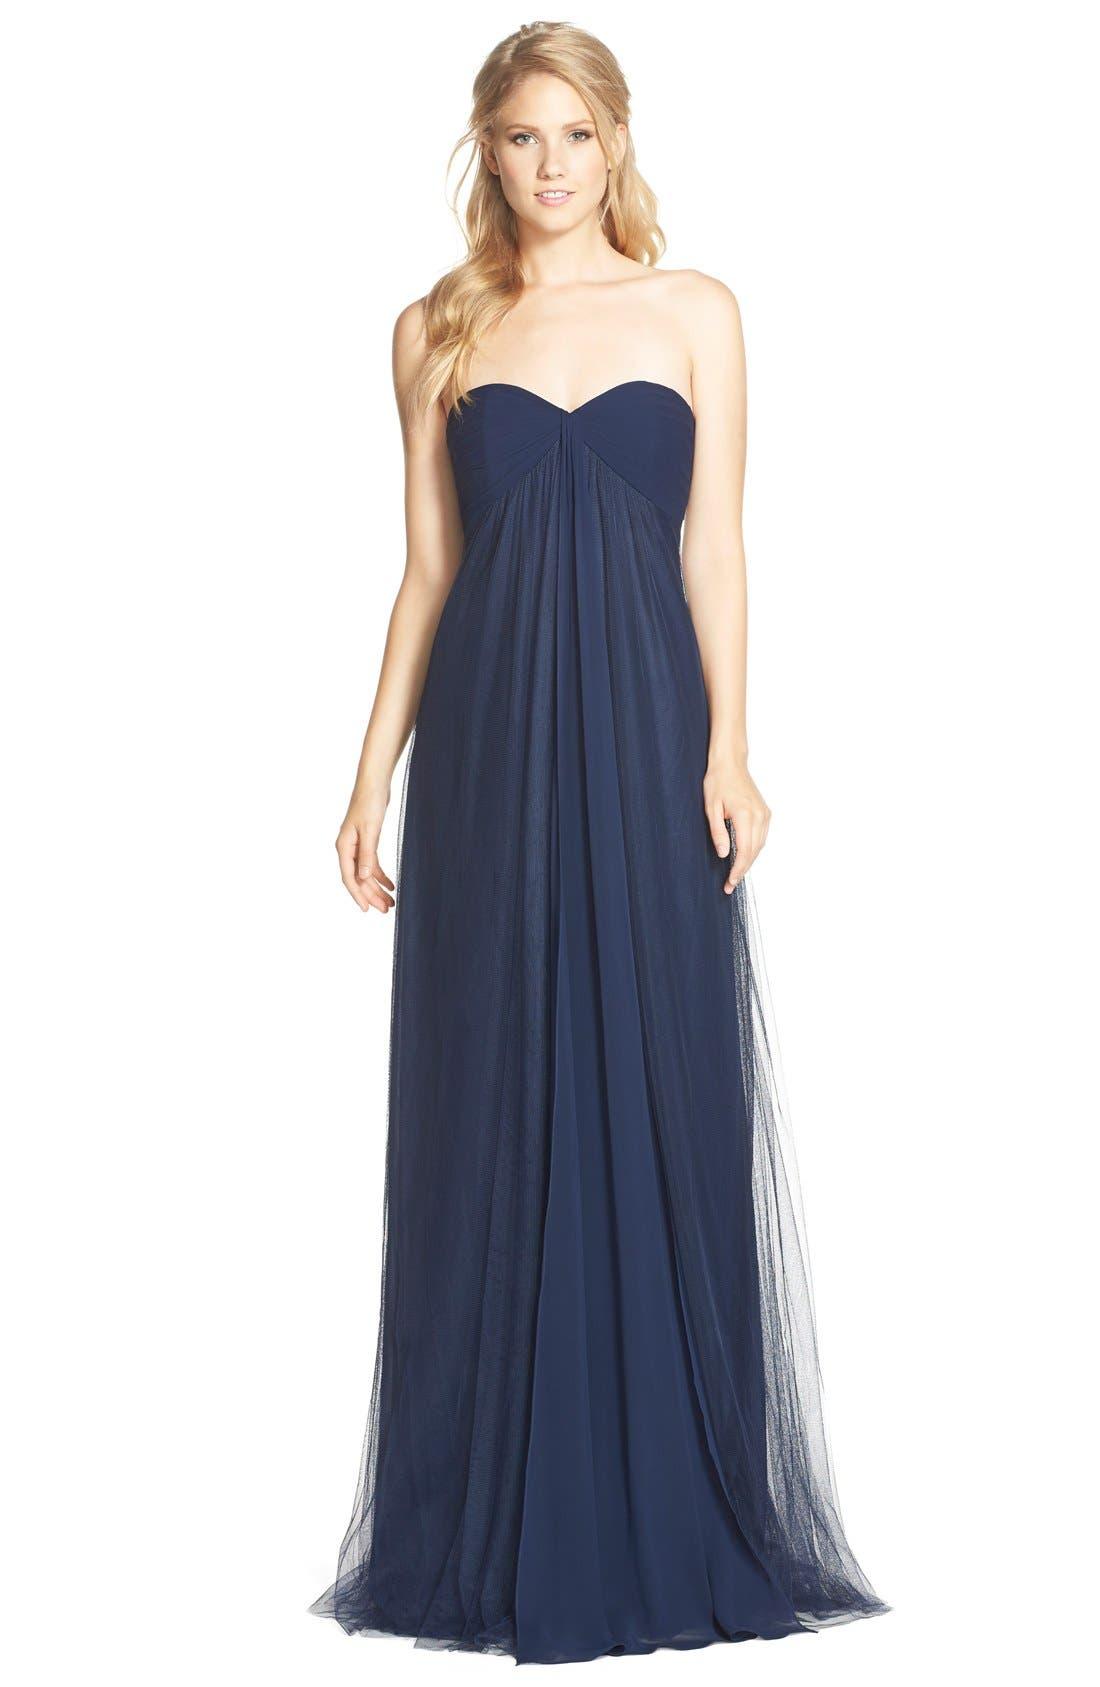 Main Image - Monique Lhuillier Bridesmaids Strapless Tulle & Chiffon Gown